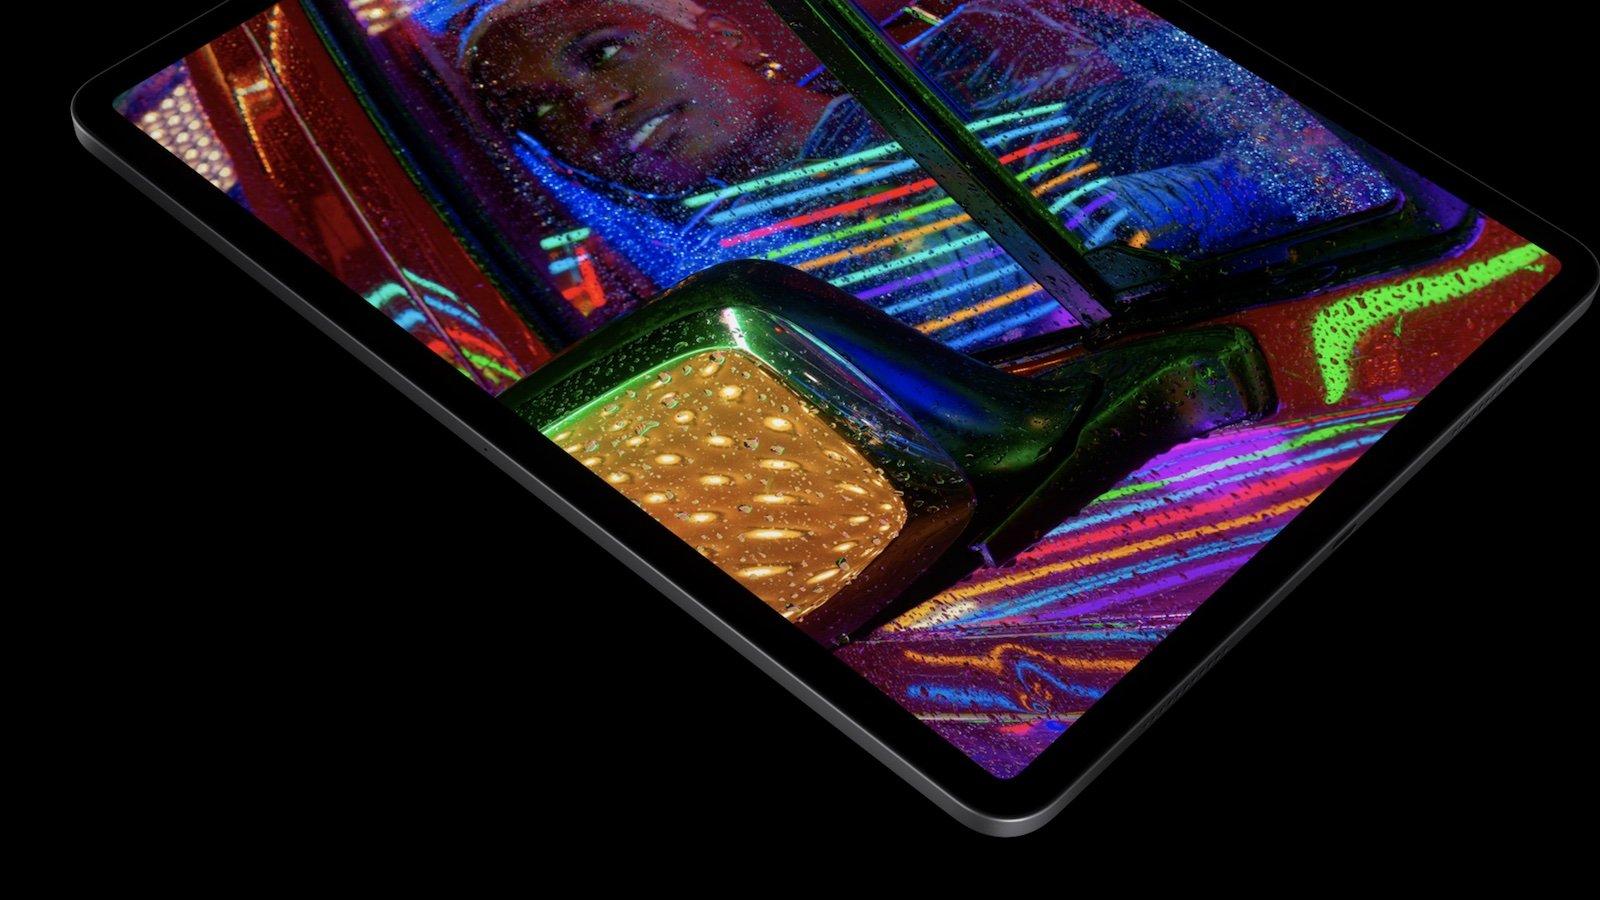 Apple iPad Pro 11-Inch with Liquid Retina Display has low reflectivity, True Tone, & more